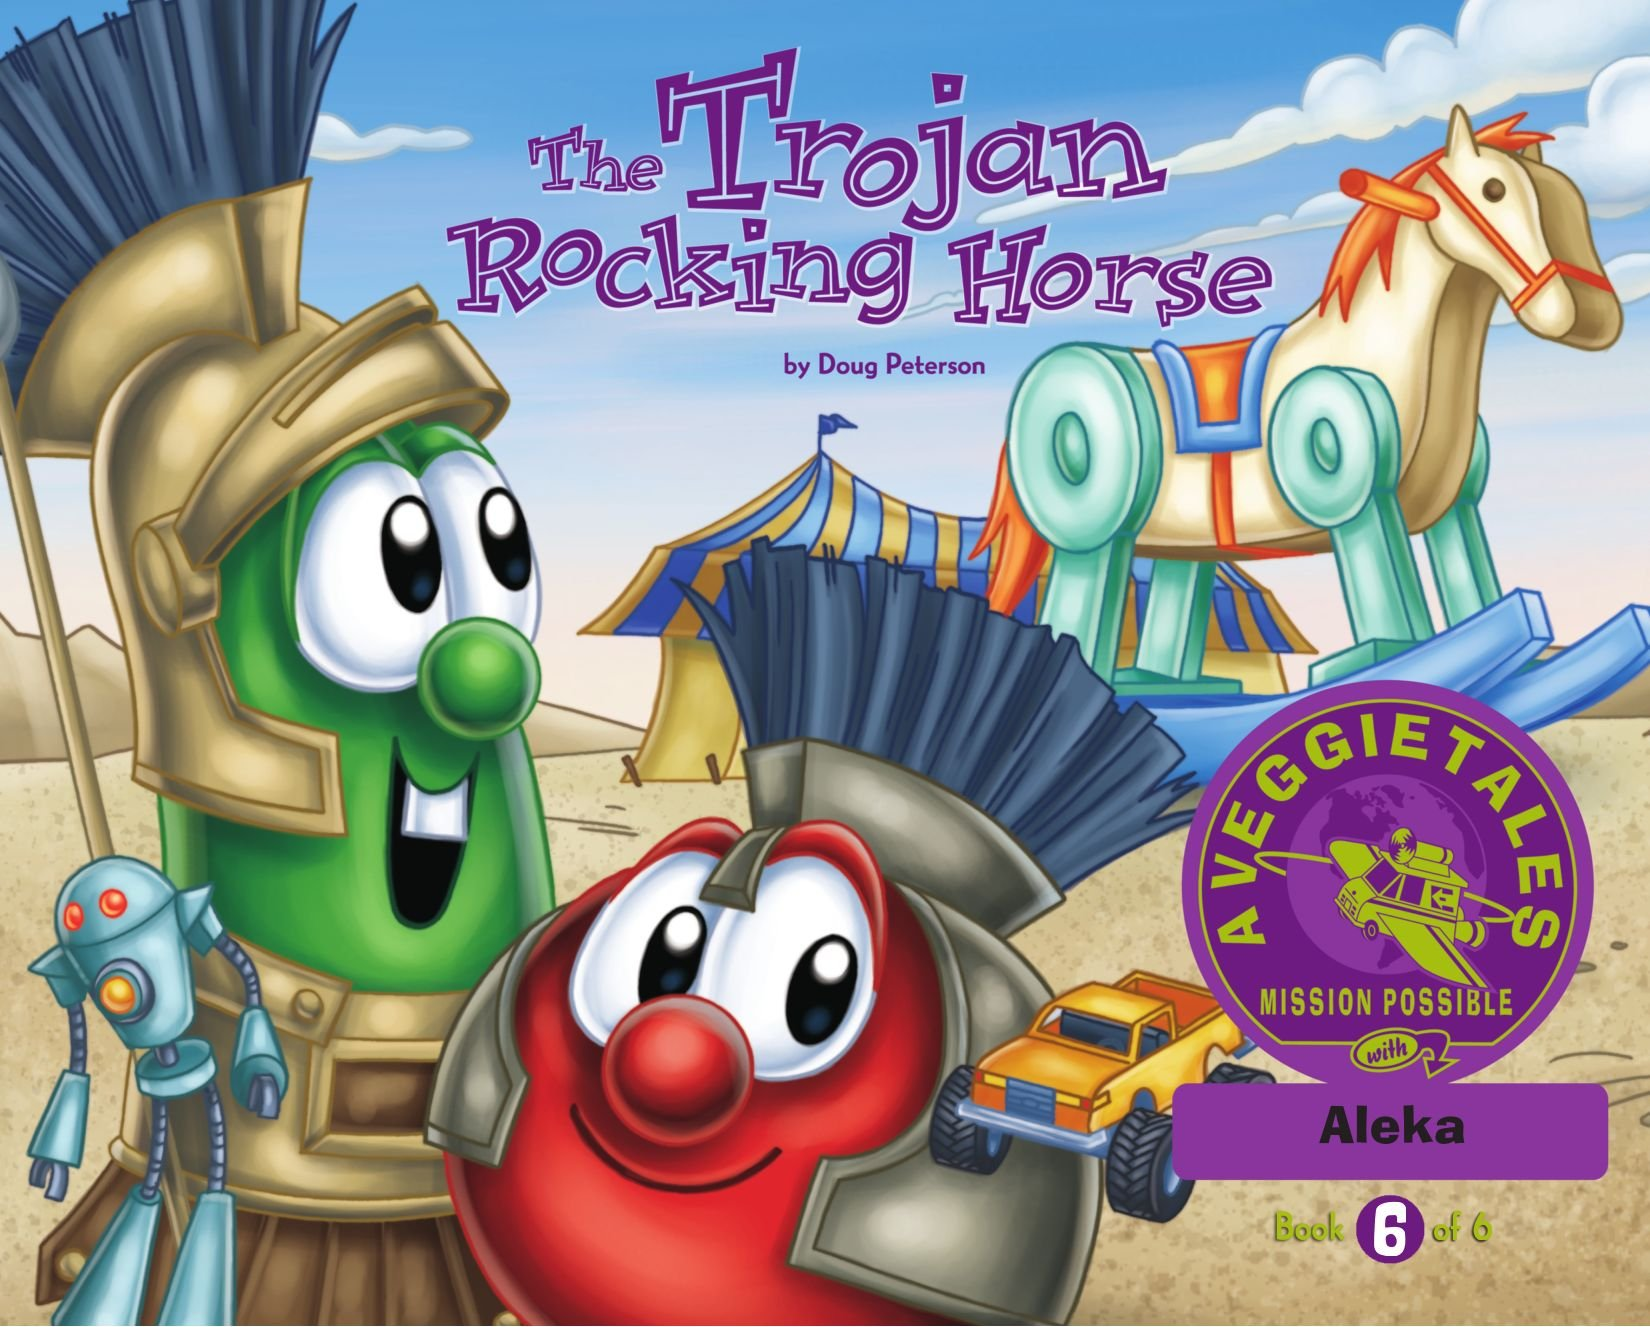 The Trojan Rocking Horse - VeggieTales Mission Possible Adventure Series #6: Personalized for Aleka (Girl) PDF